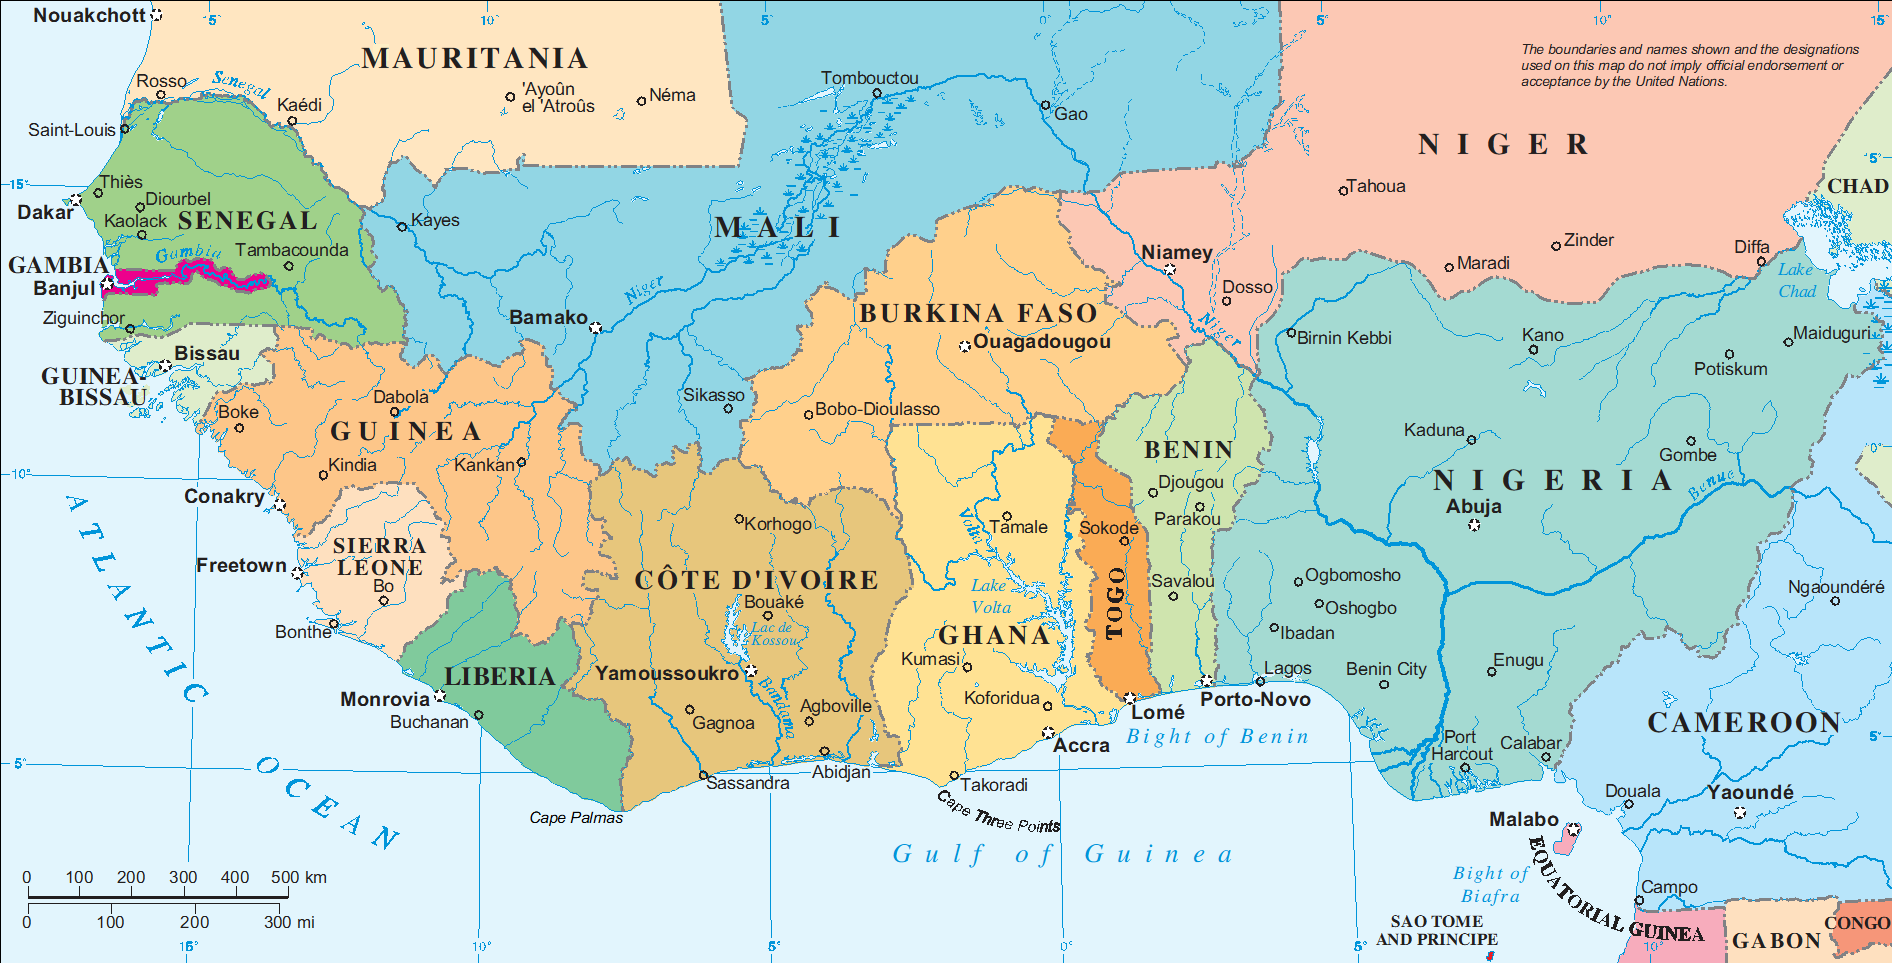 Benin Physical Map entity relationship diagram sample